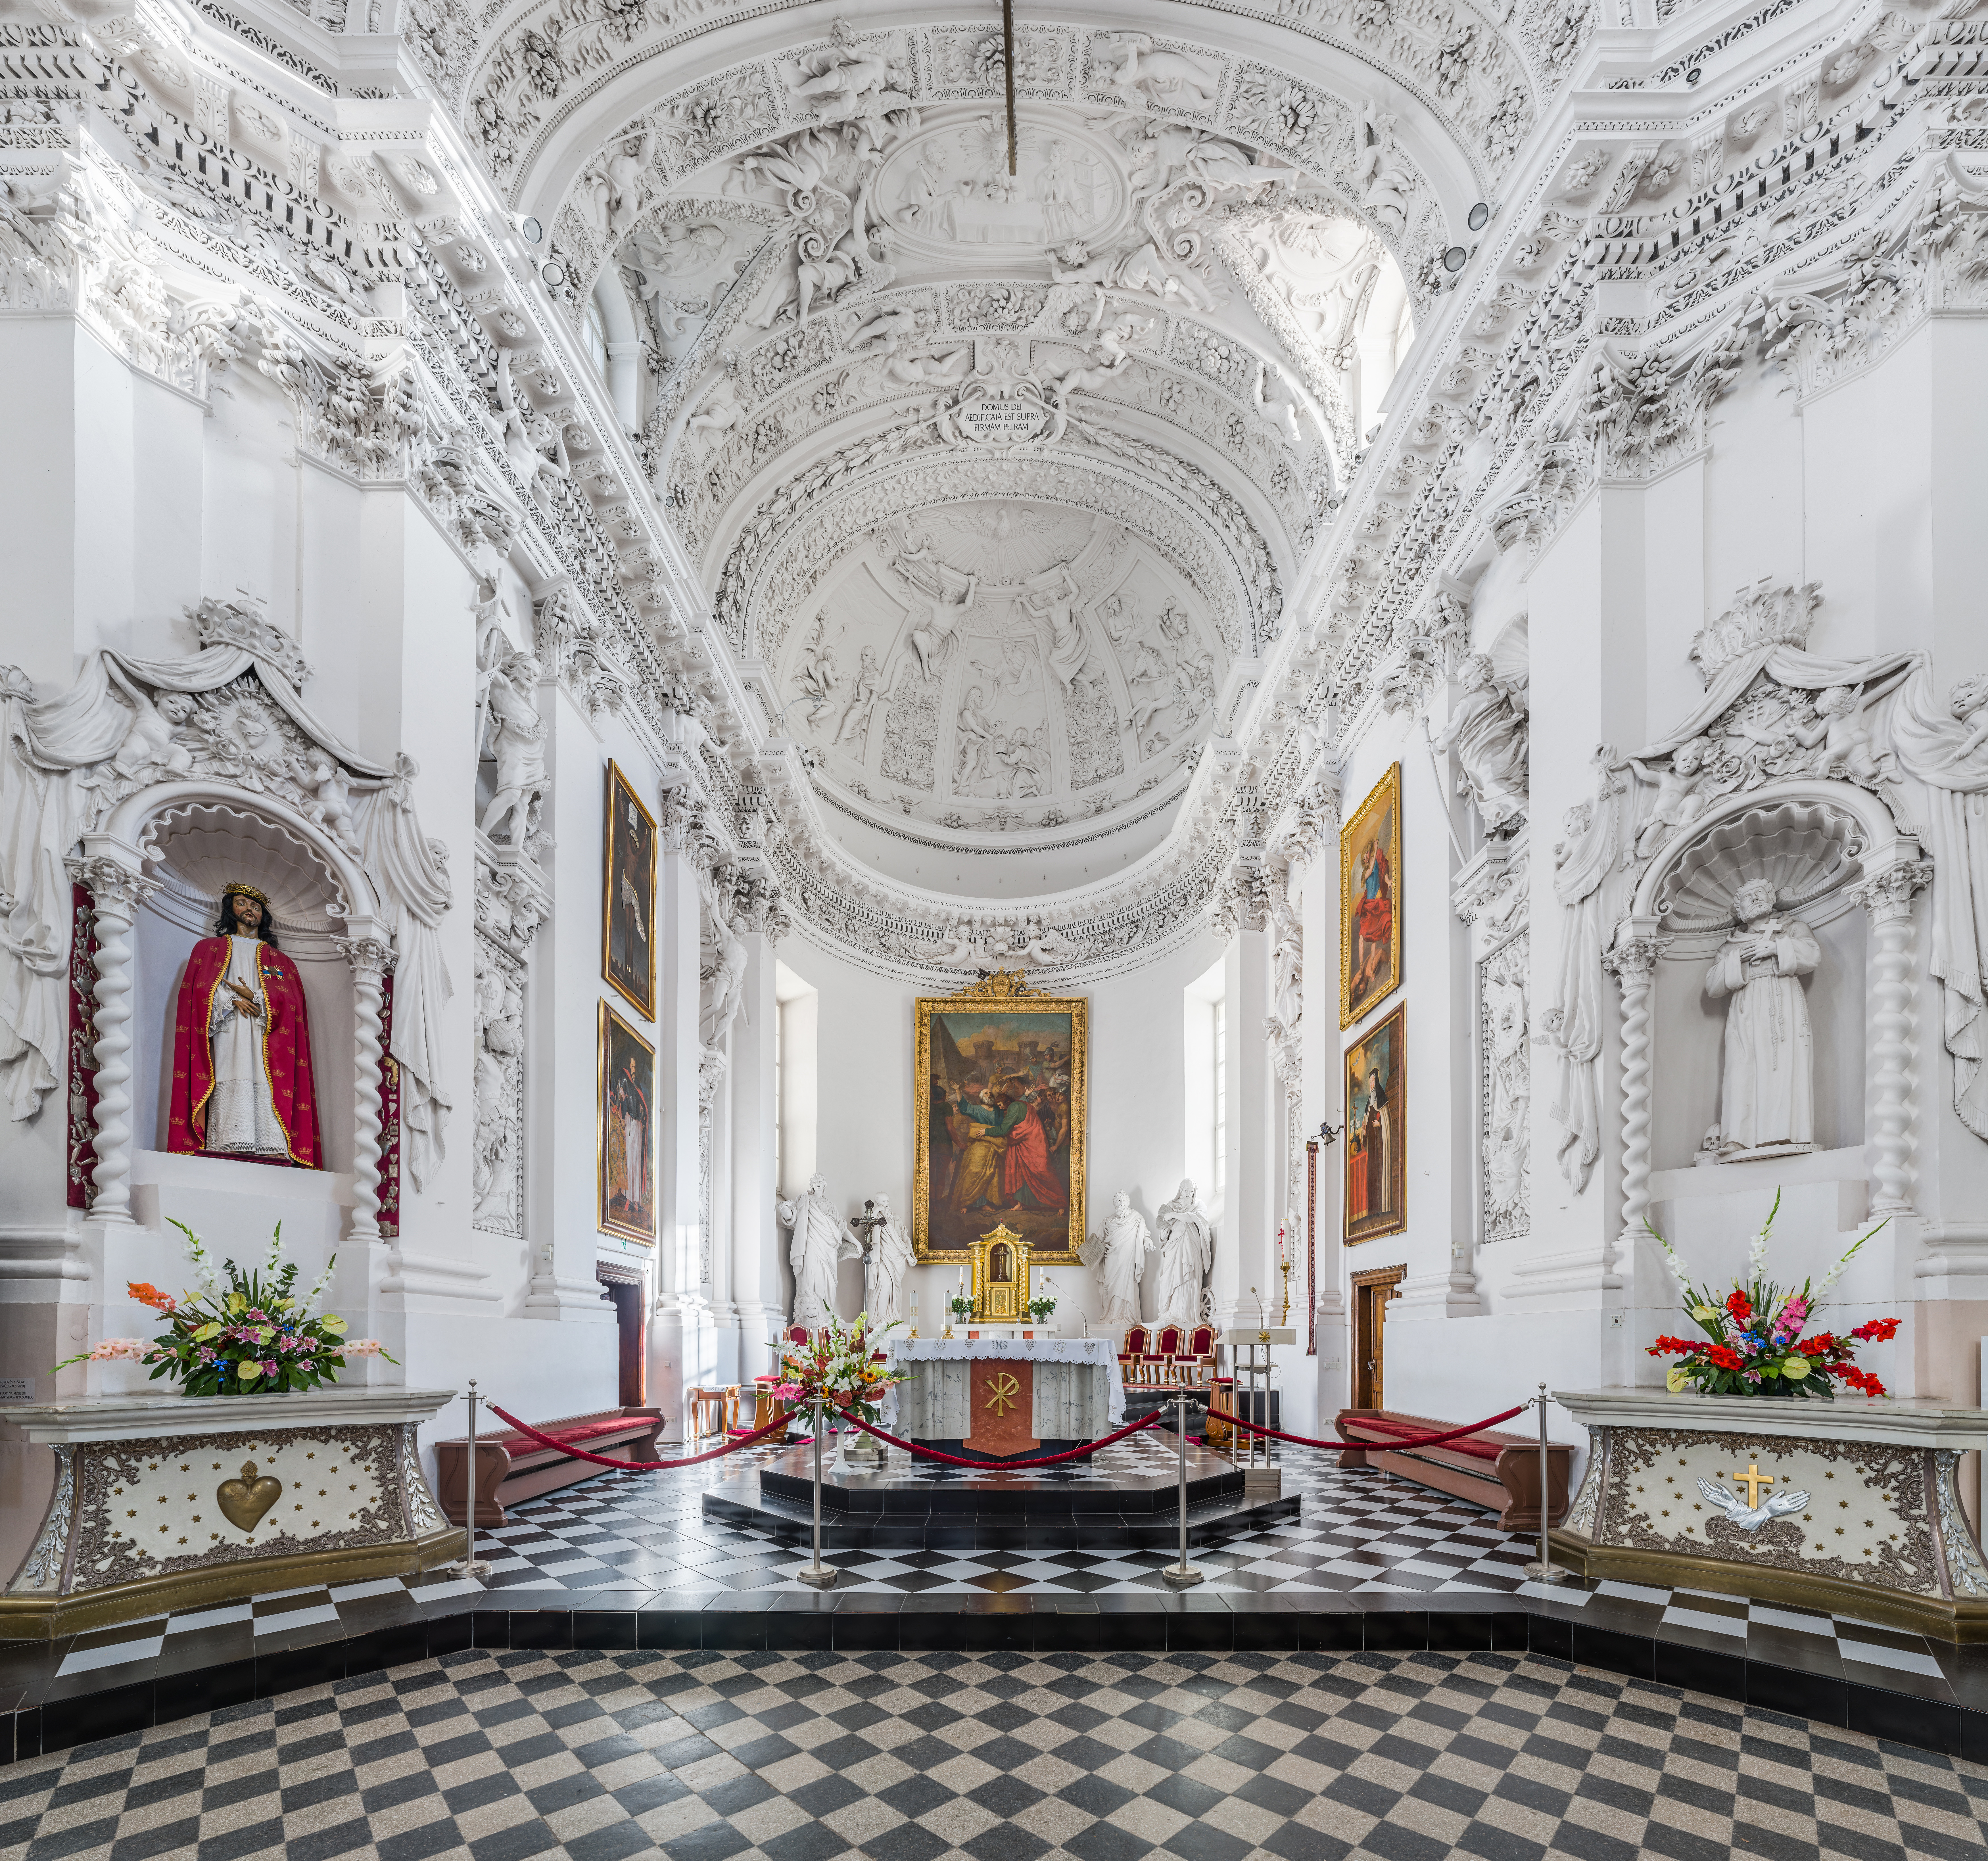 https://upload.wikimedia.org/wikipedia/commons/7/7e/St._Peter_and_St._Paul%27s_Church_3%2C_Vilnius%2C_Lithuania_-_Diliff.jpg